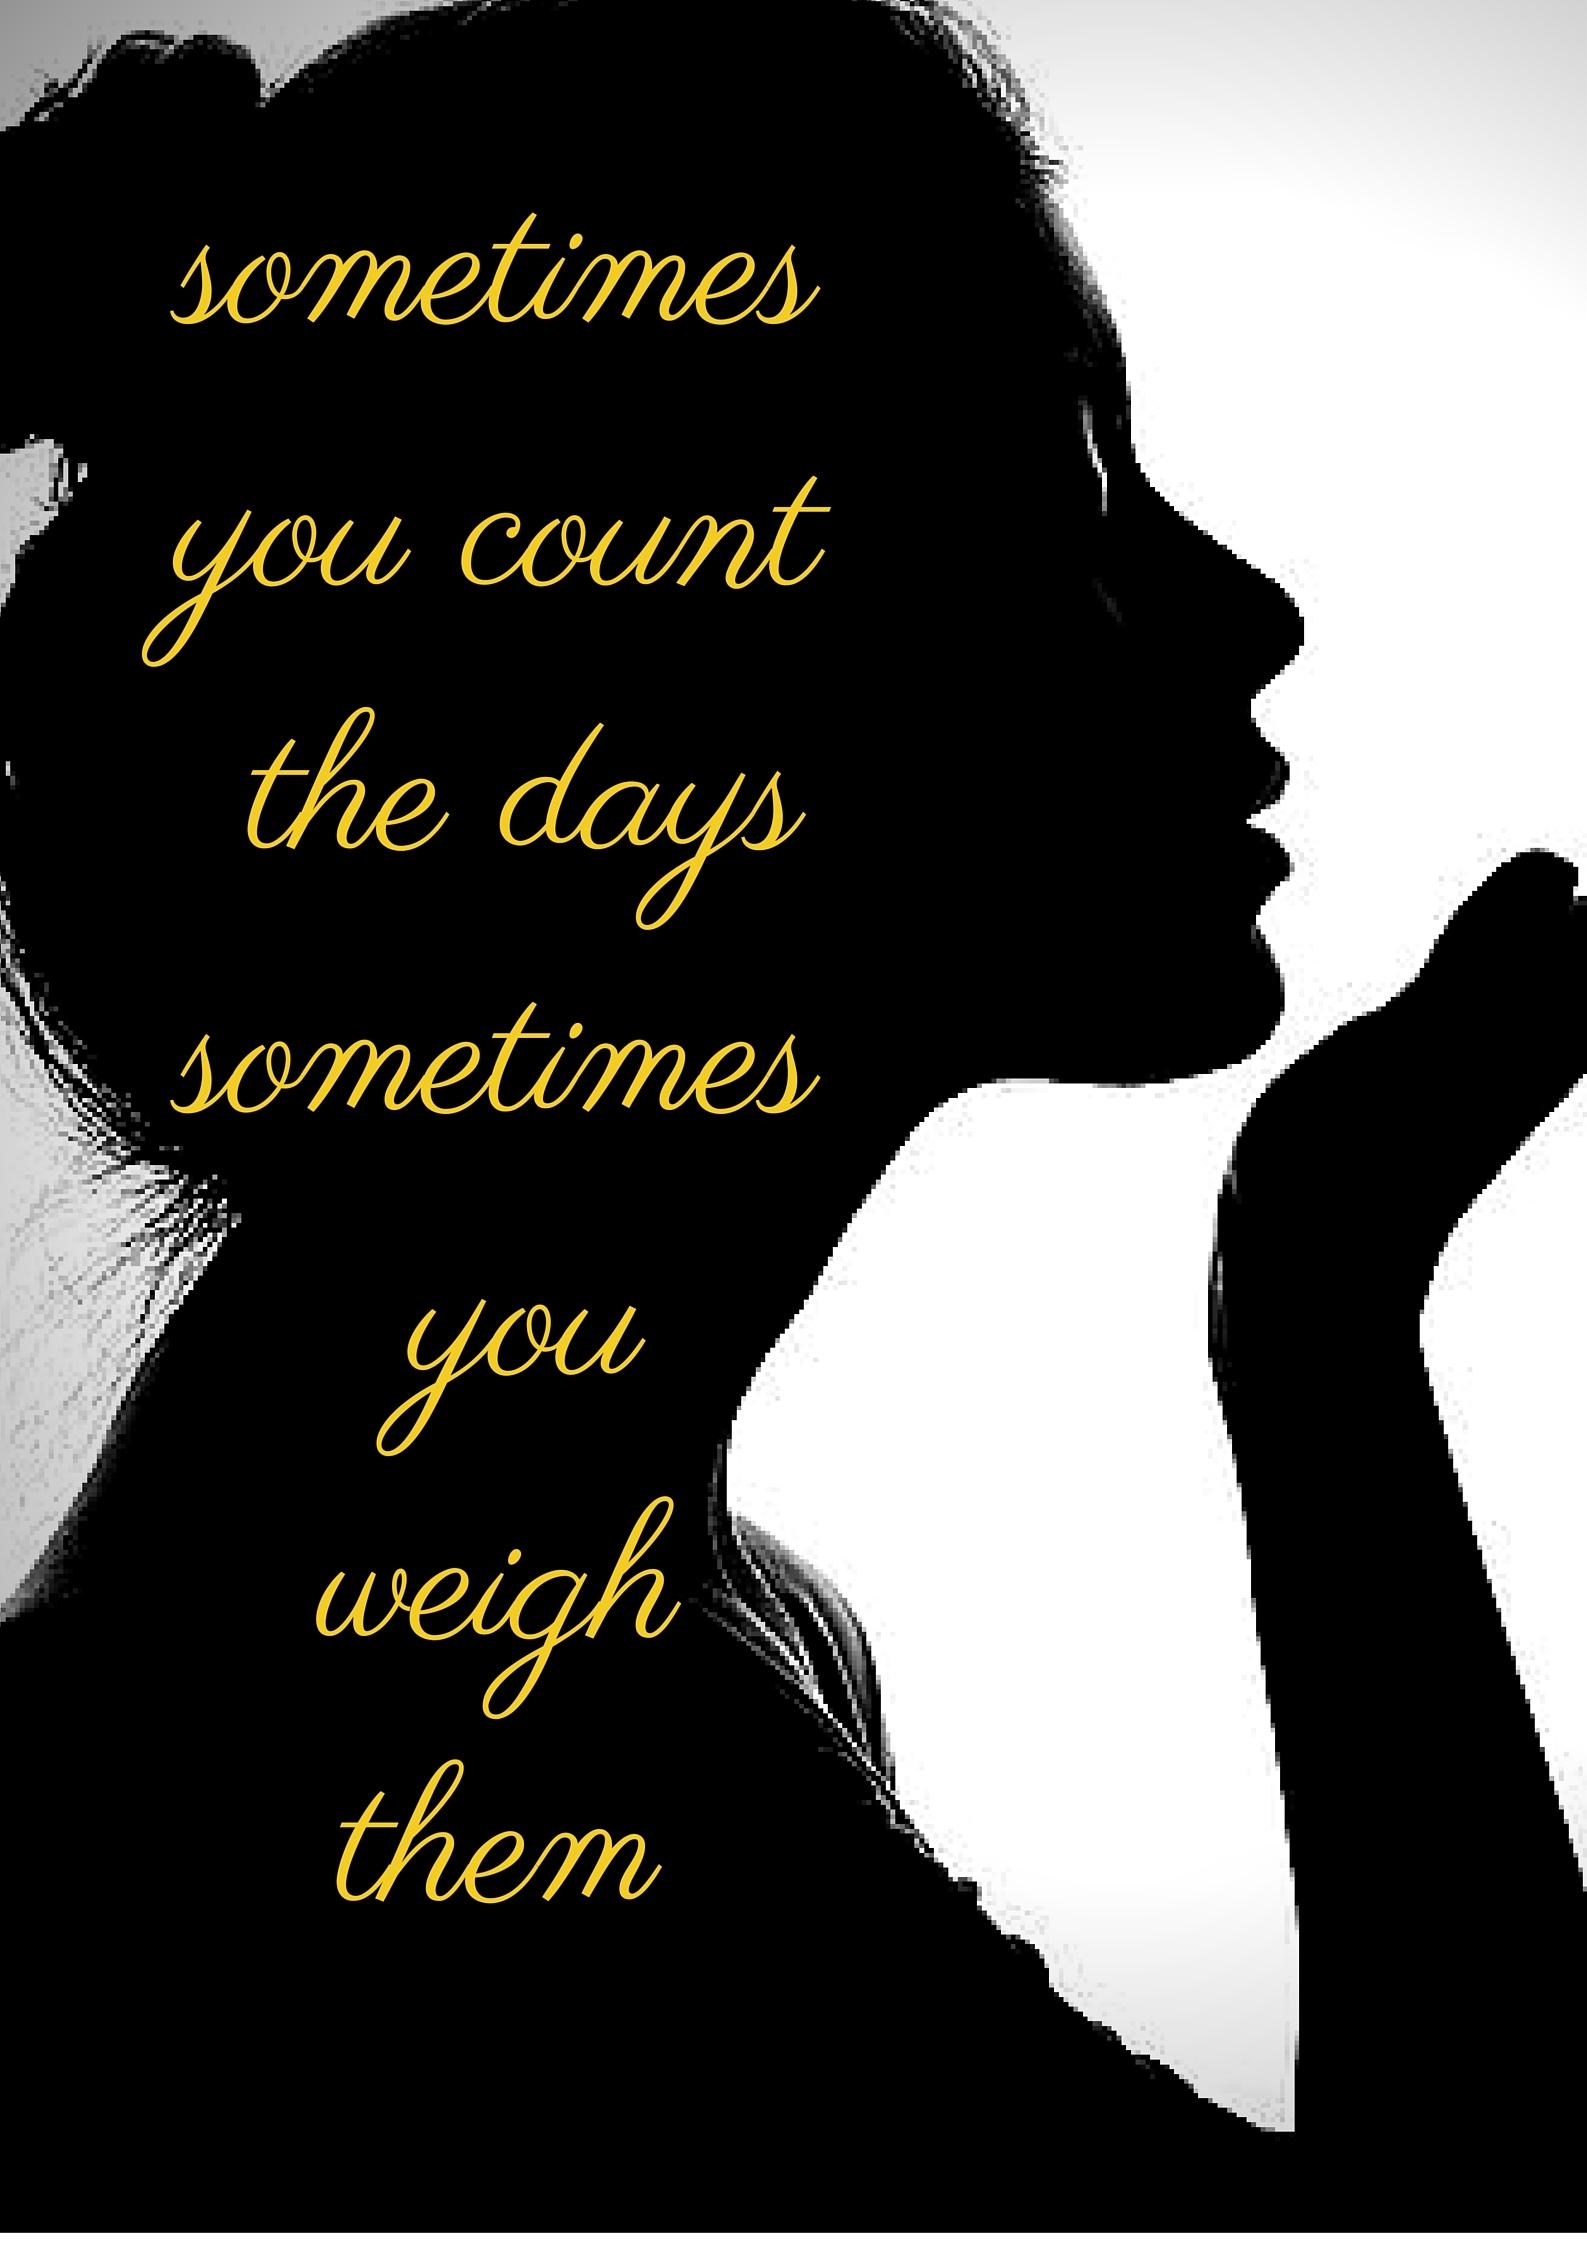 Quote Elizabeth Gilbert Count Days.jpg